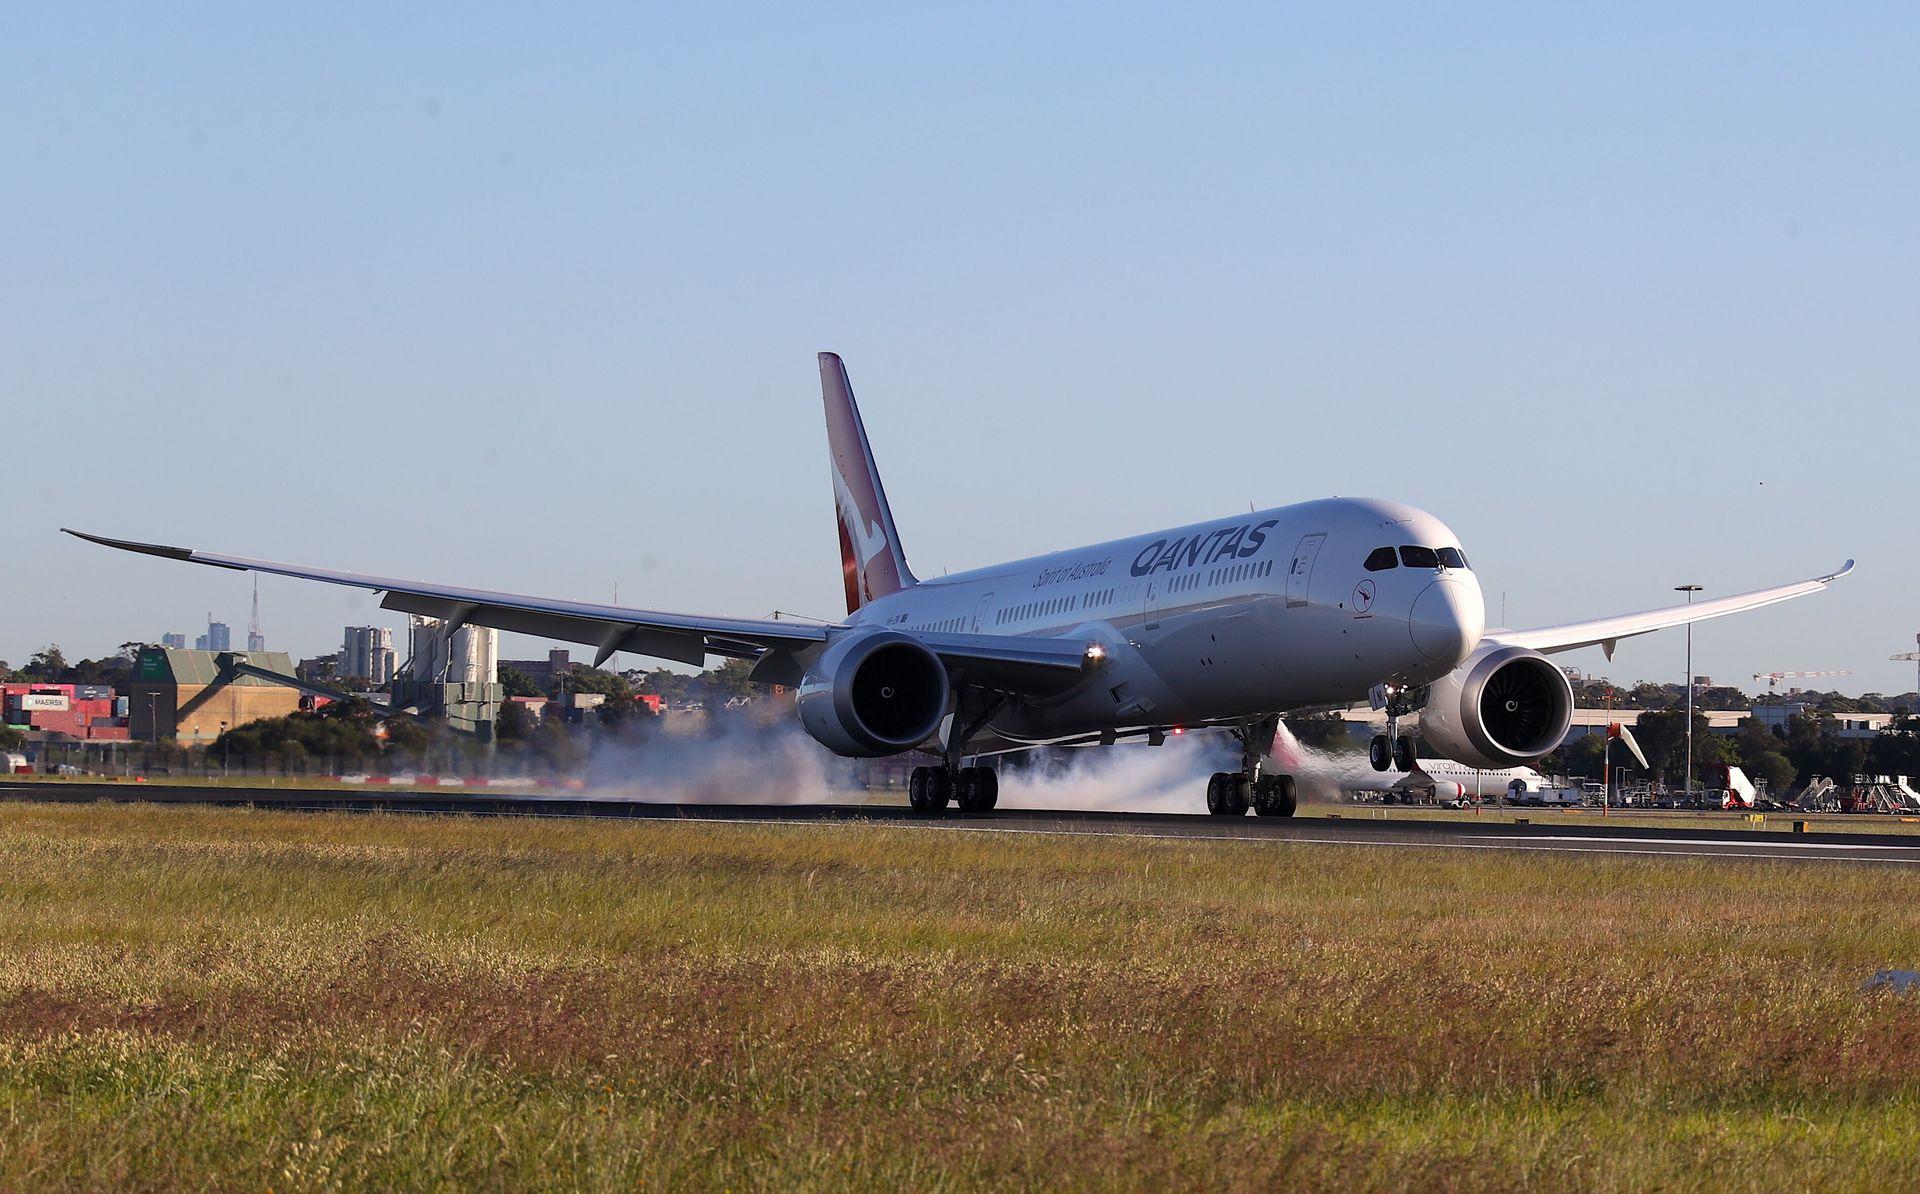 Watch: Inside Qantas' historic New York-Sydney flight